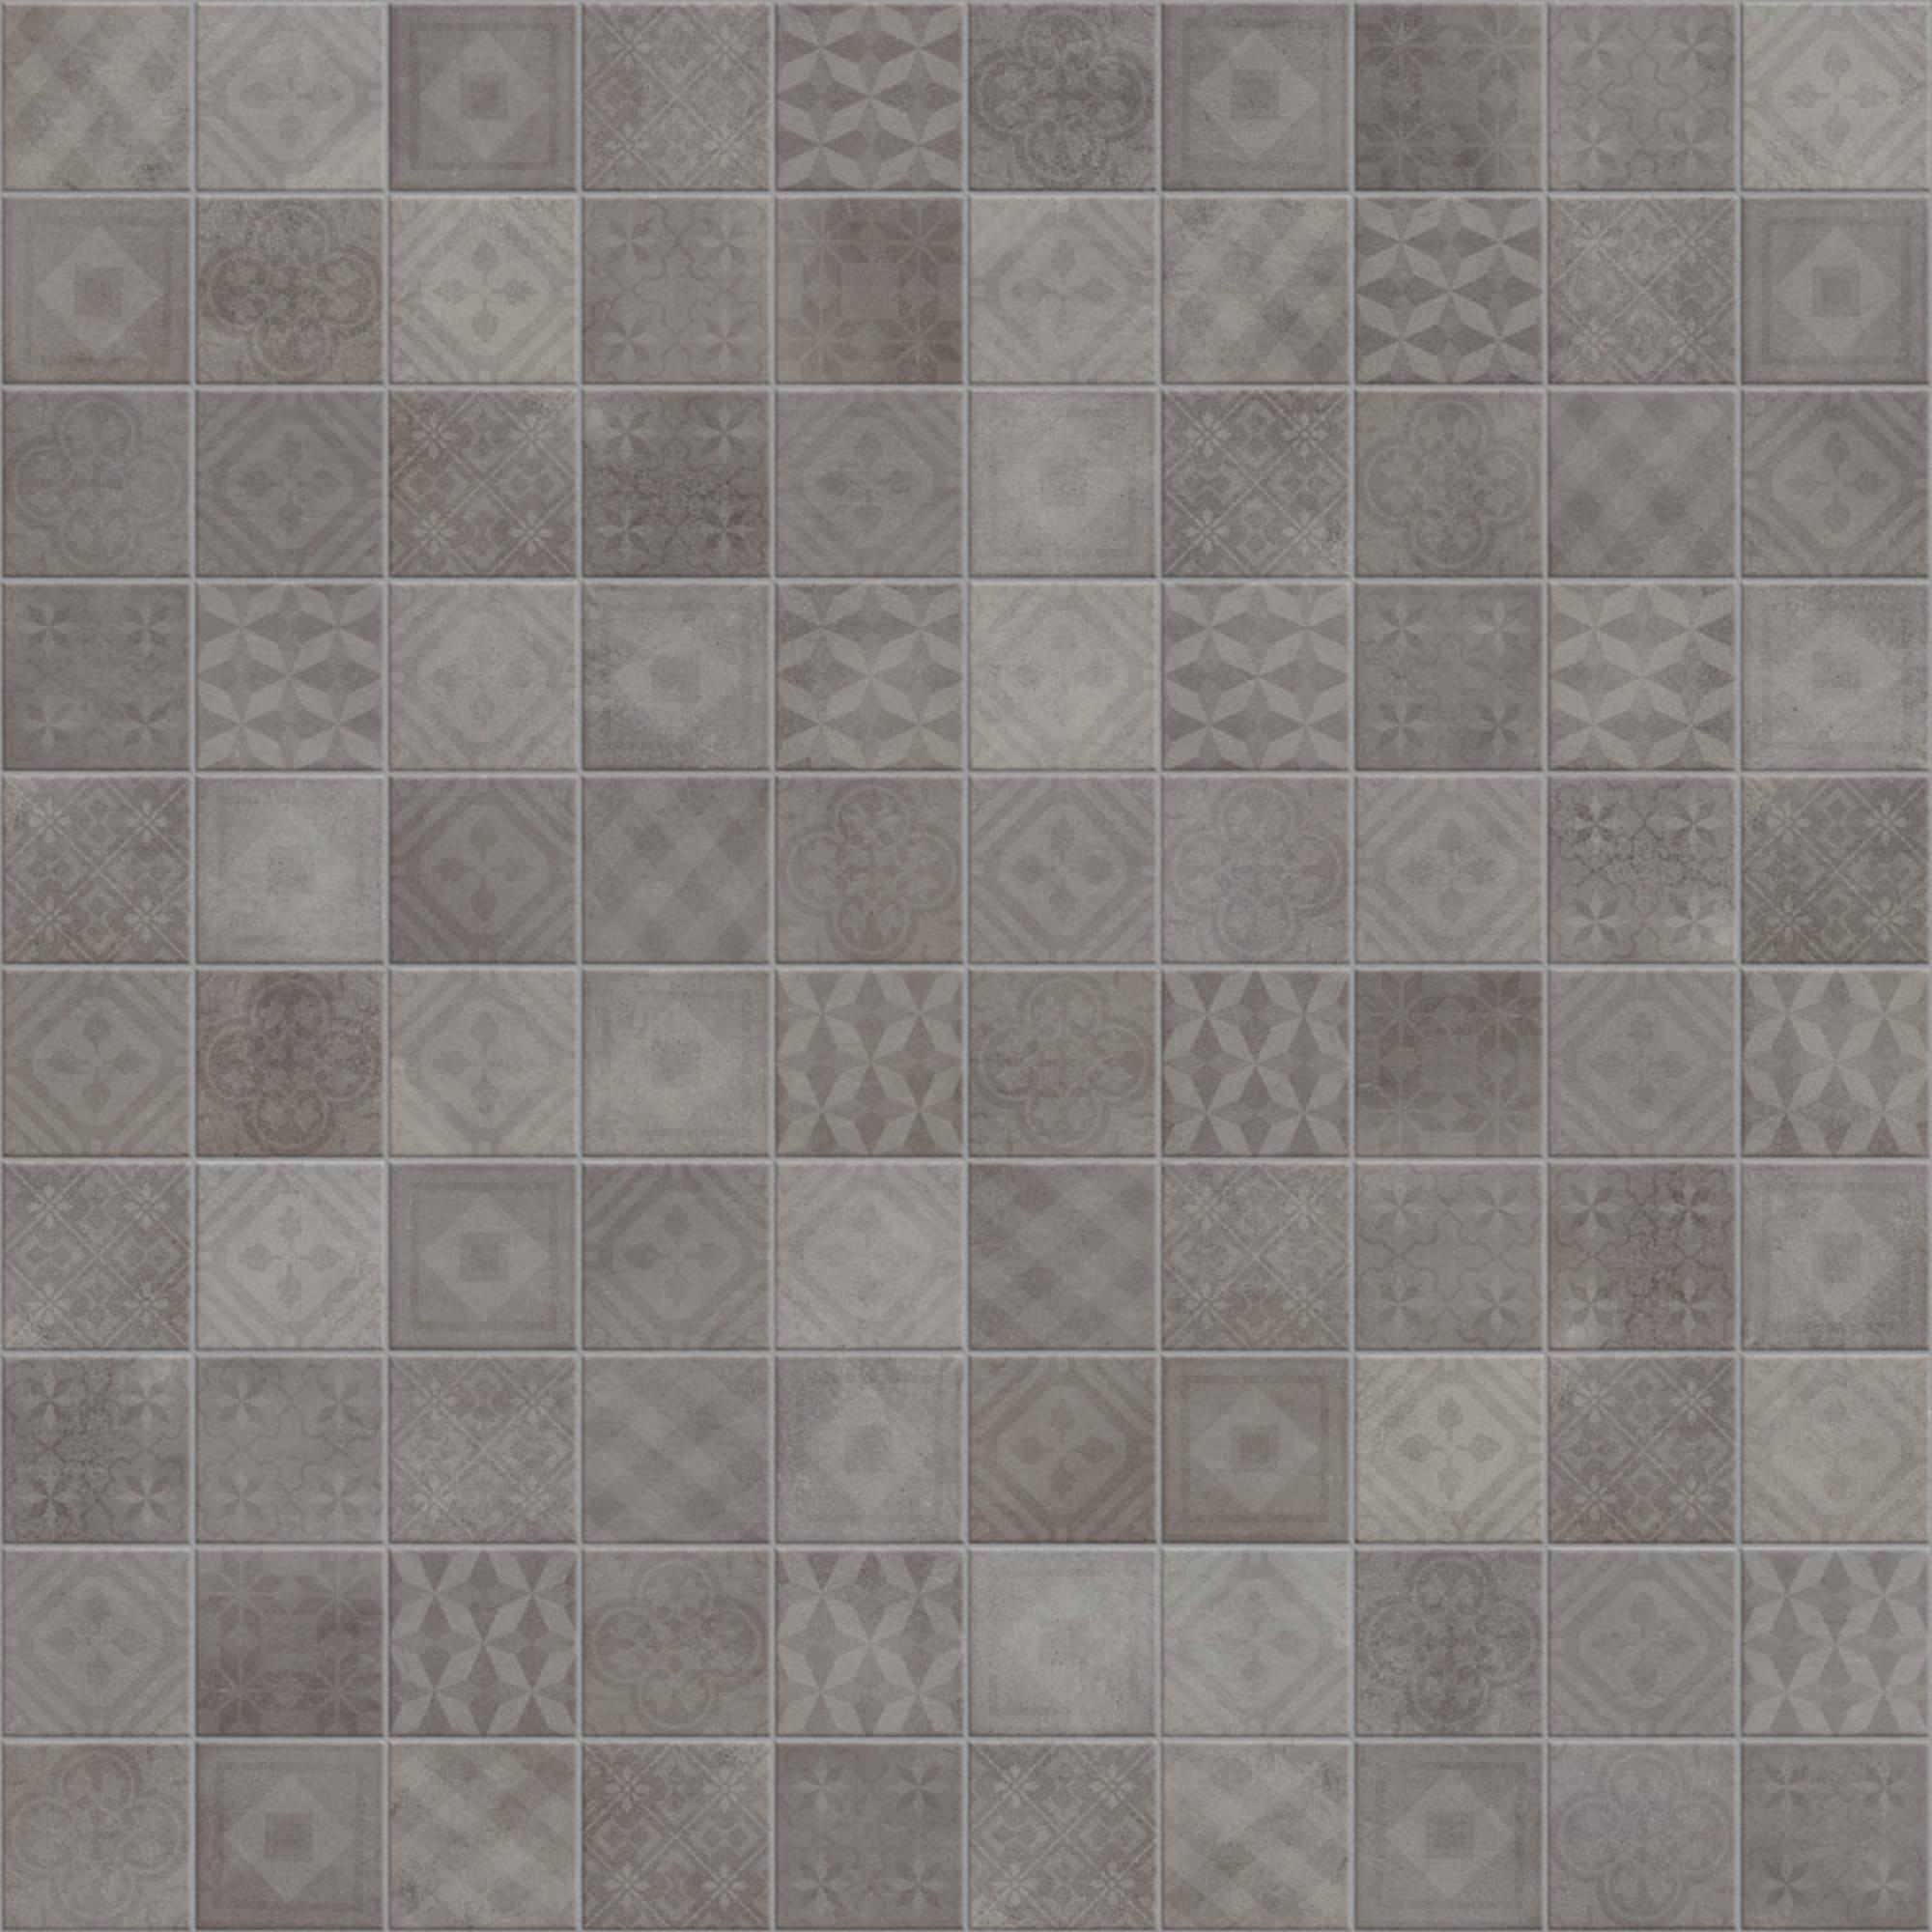 Vloertegel Terratinta Betonsquare 10x10 cm clay mud decor 0,88 M2